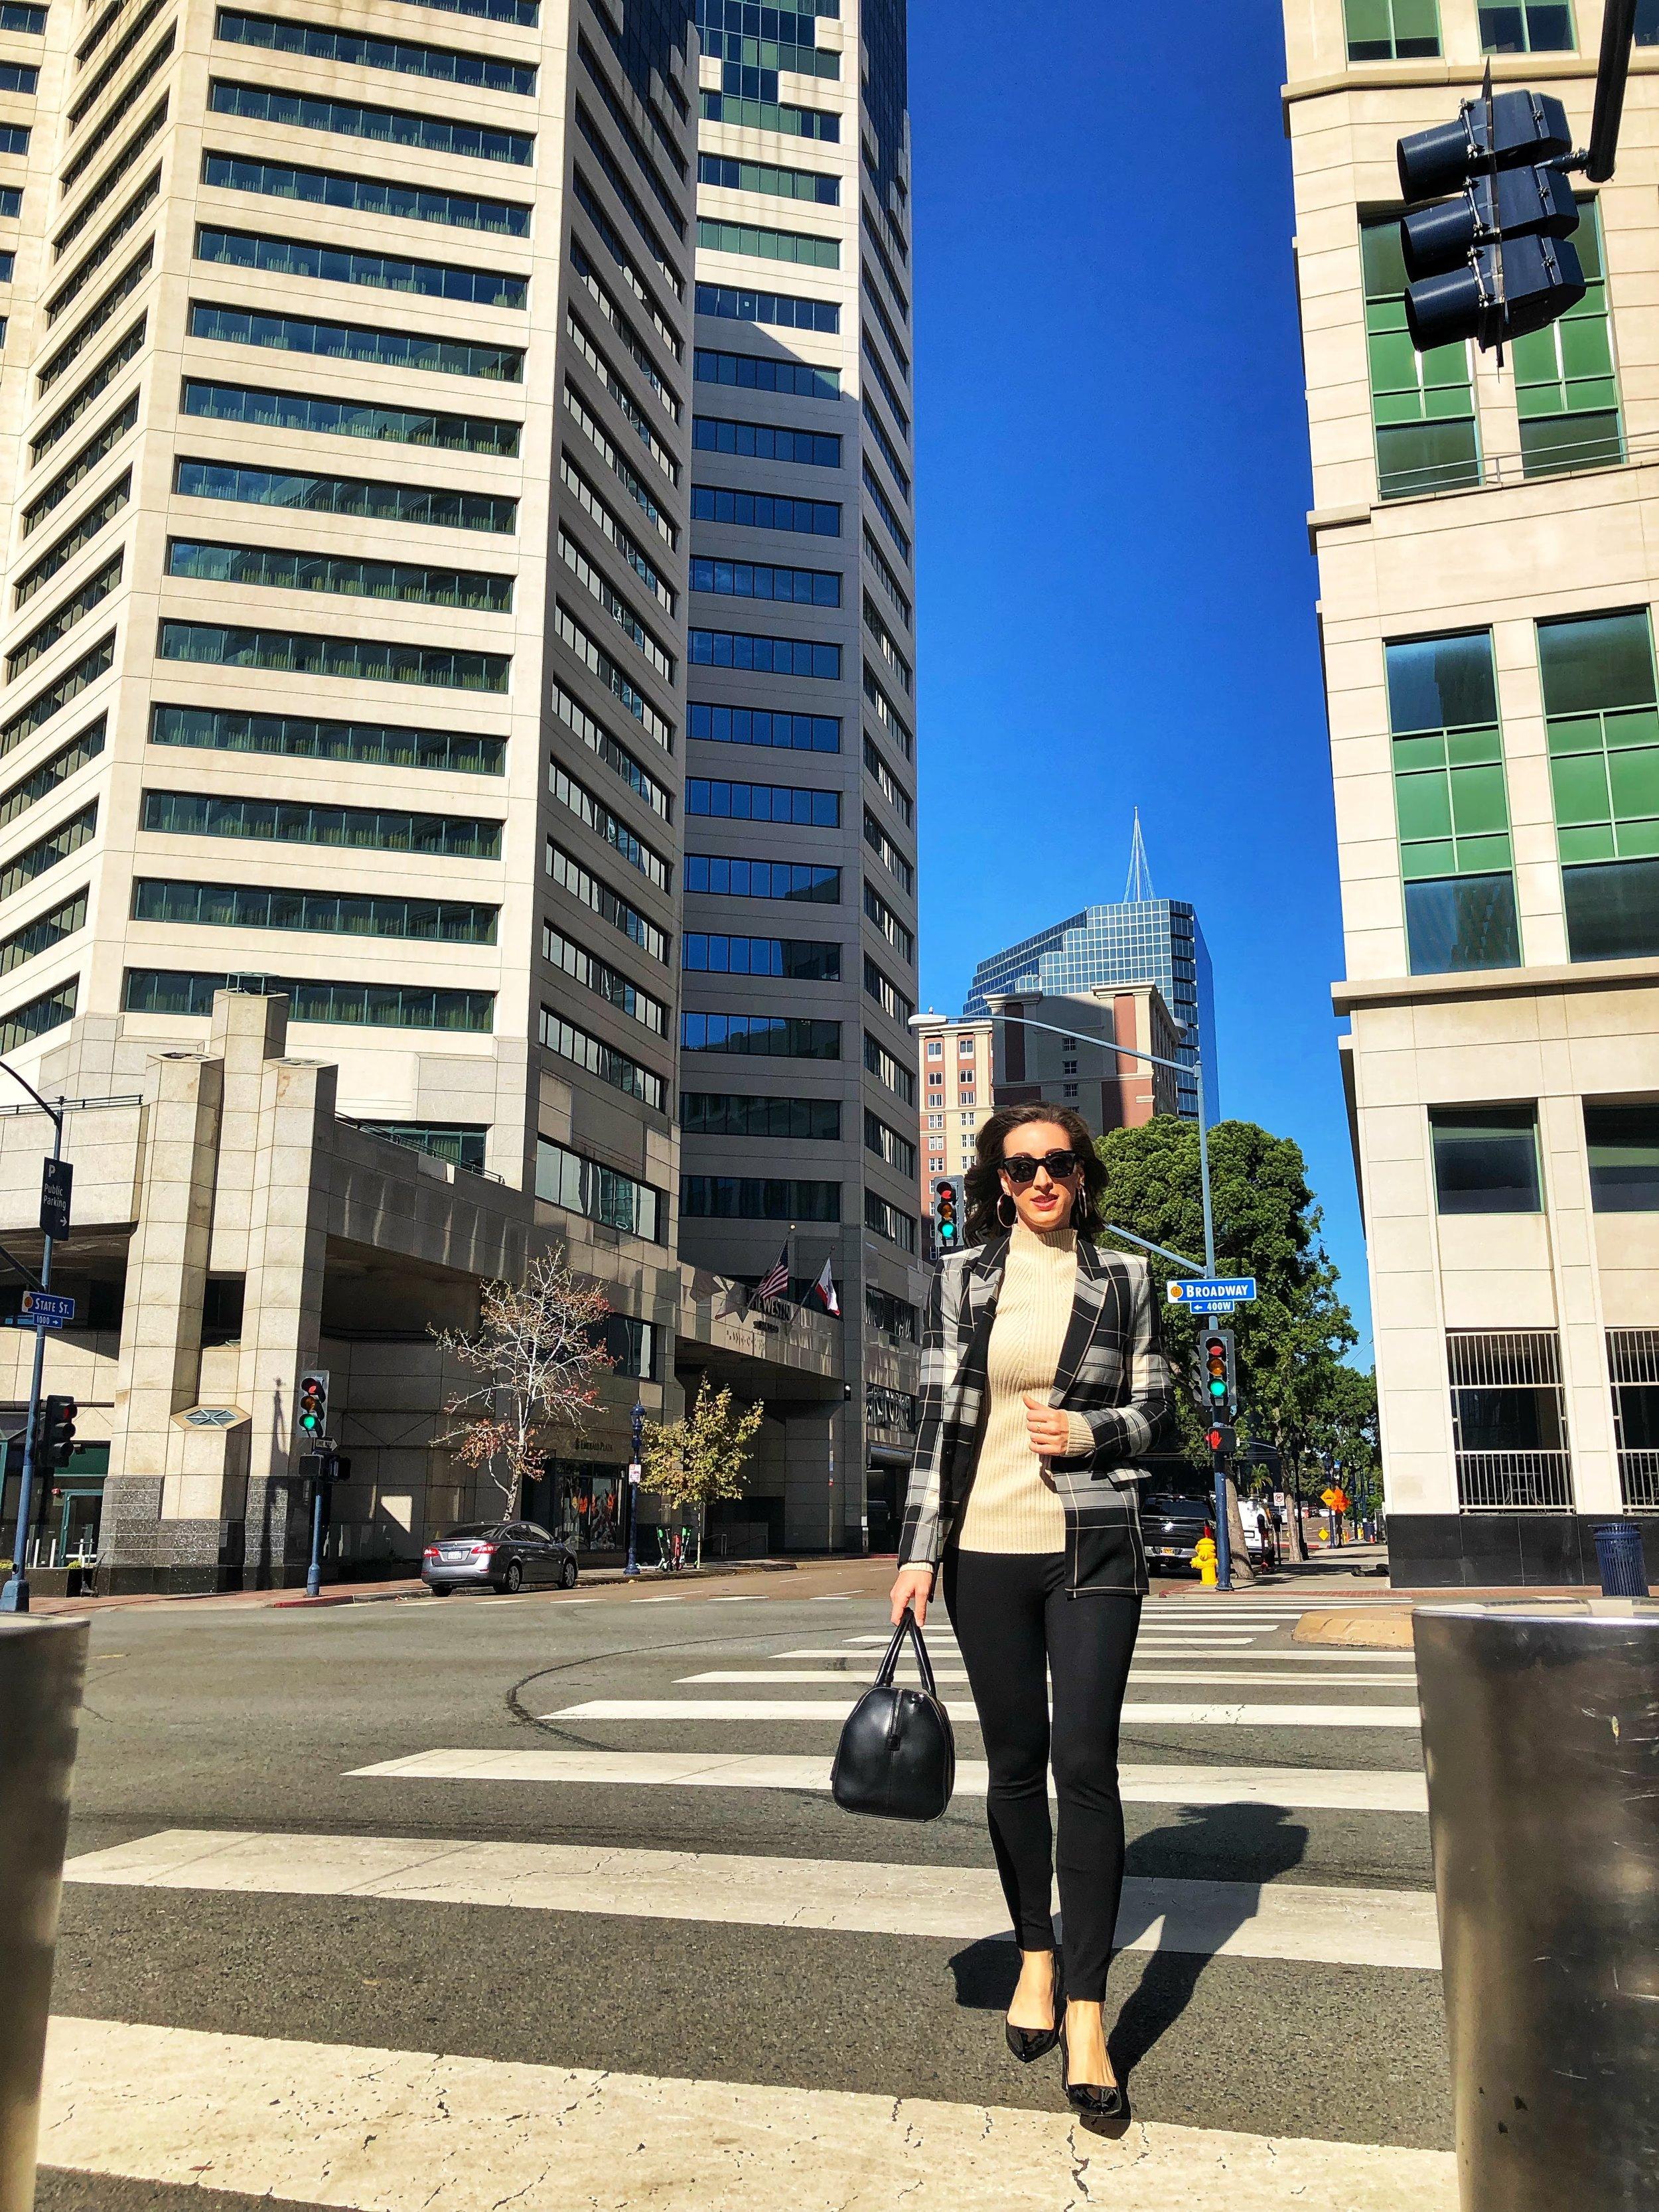 Commuting to work, work style Downtown San Diego, Emerald Plaza Westin Hotel